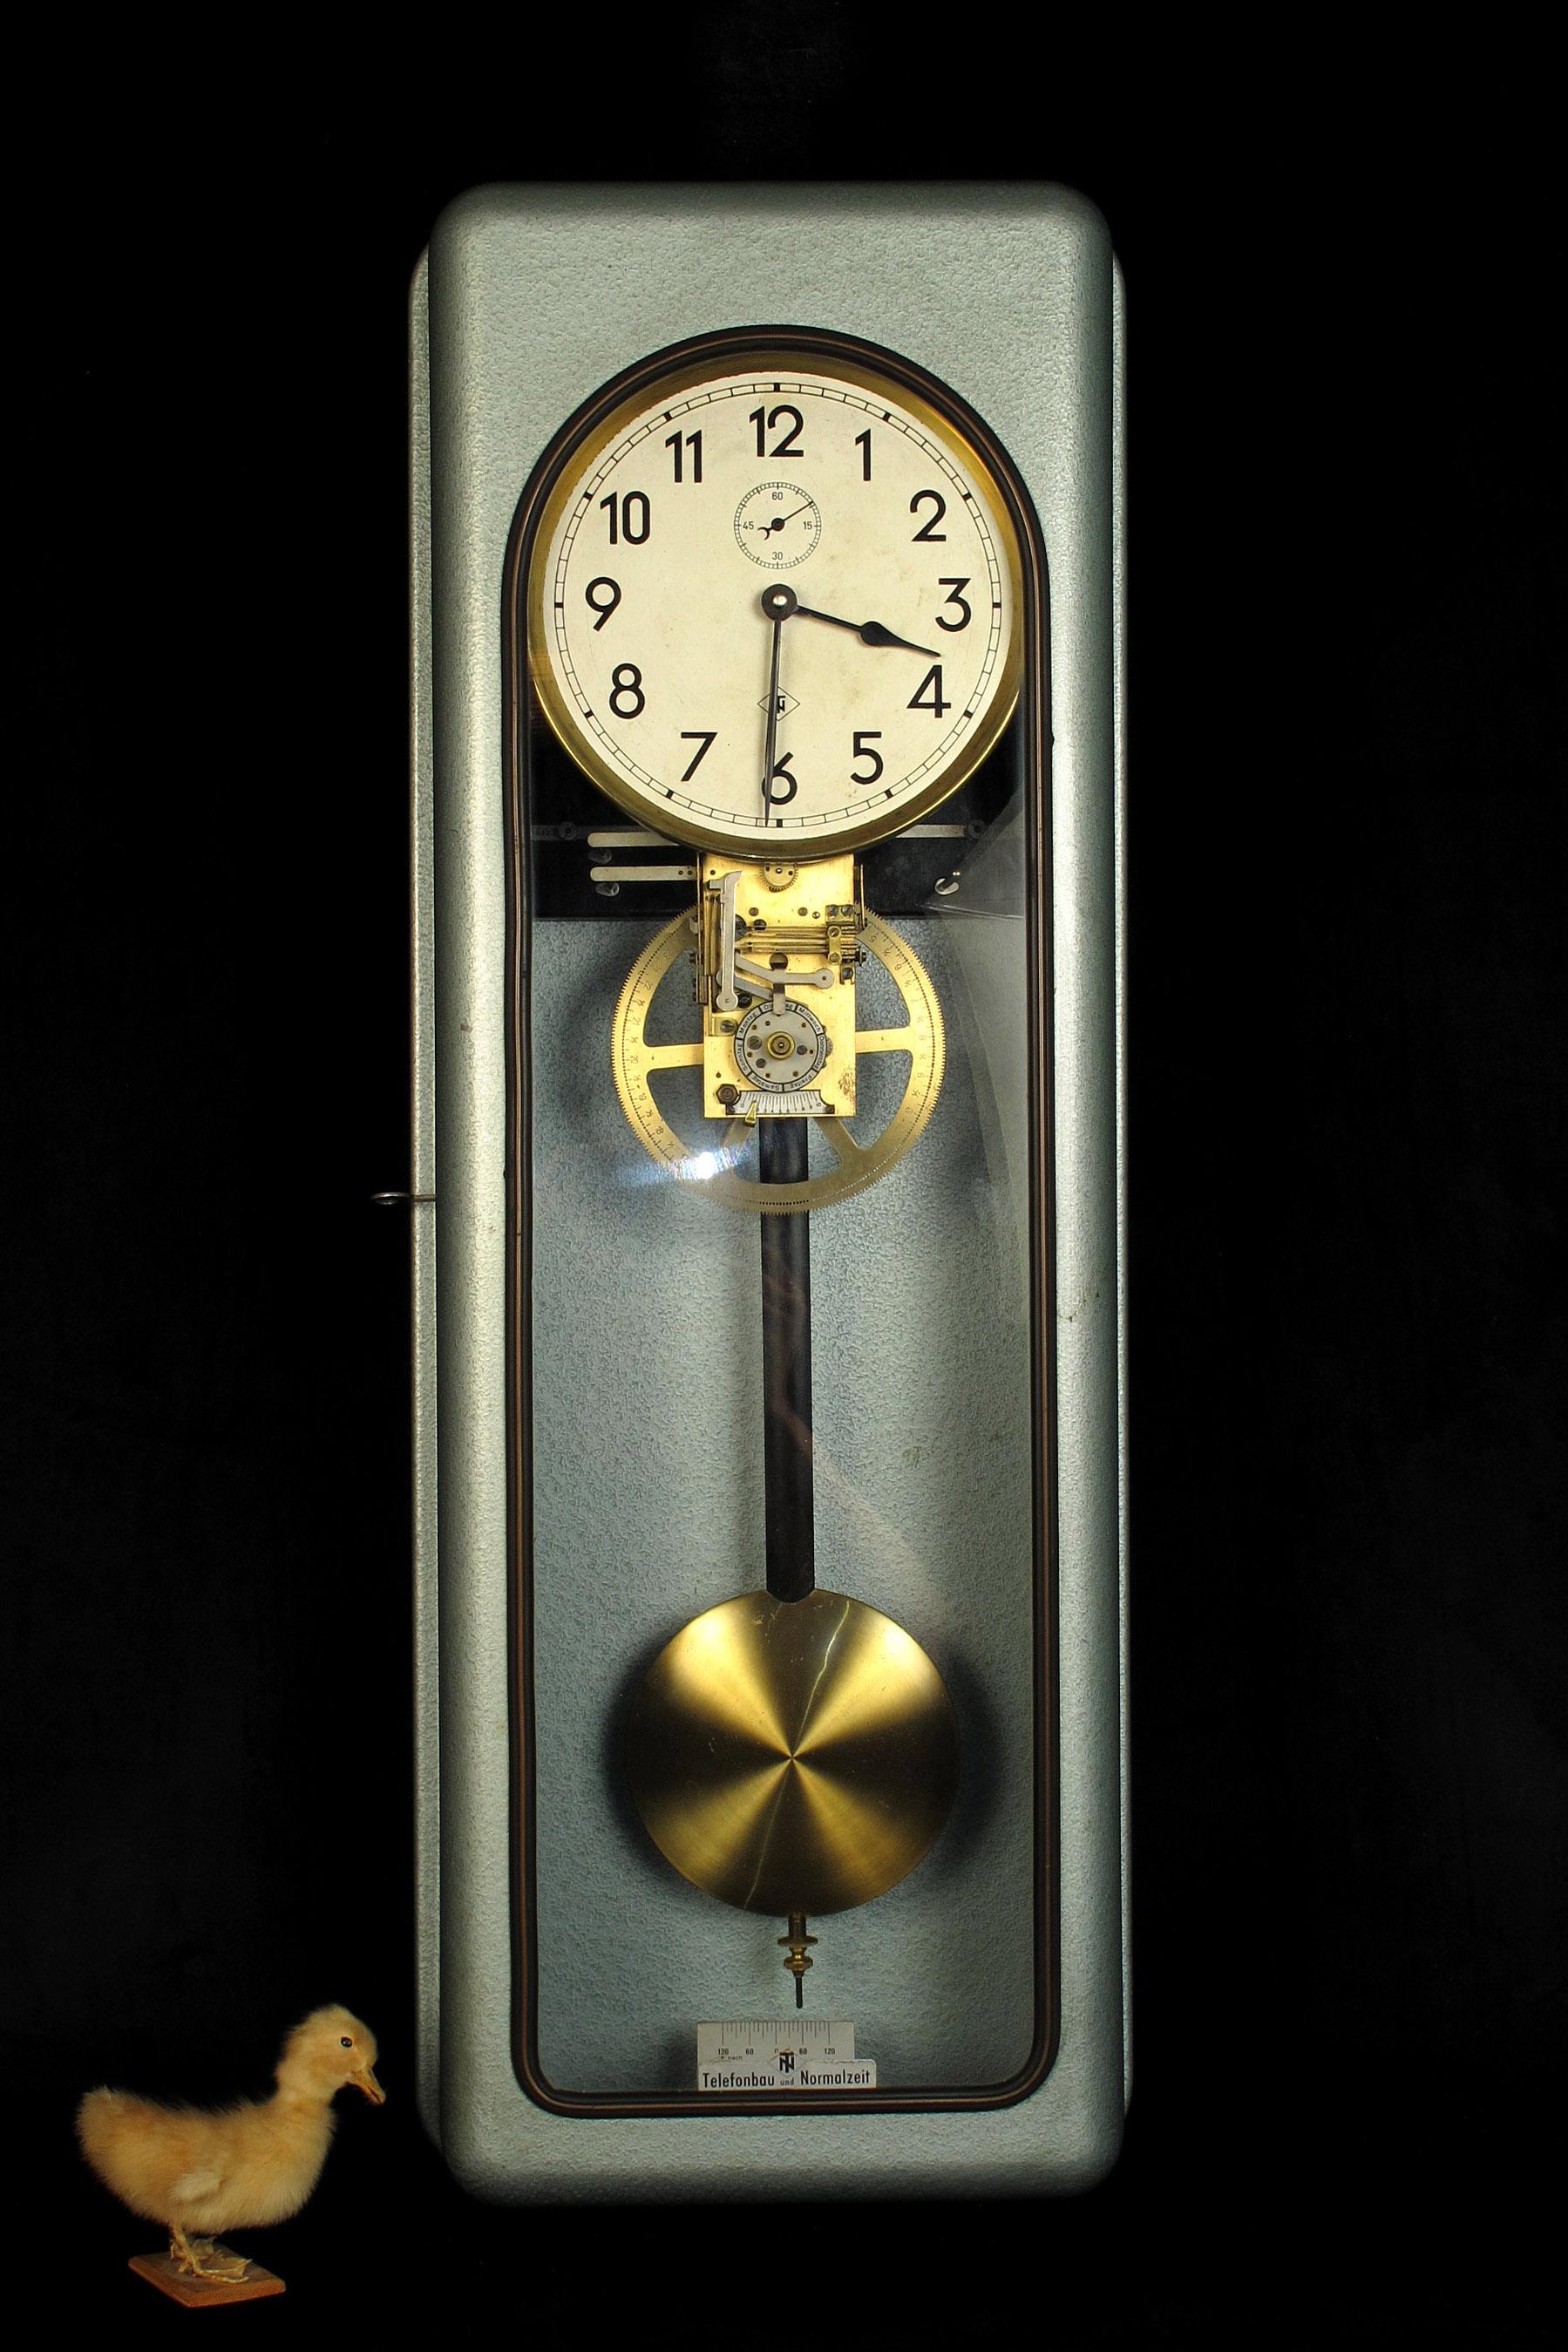 ancienne et grande horloge industrielle telenorma vers 1940 old school bazaar. Black Bedroom Furniture Sets. Home Design Ideas